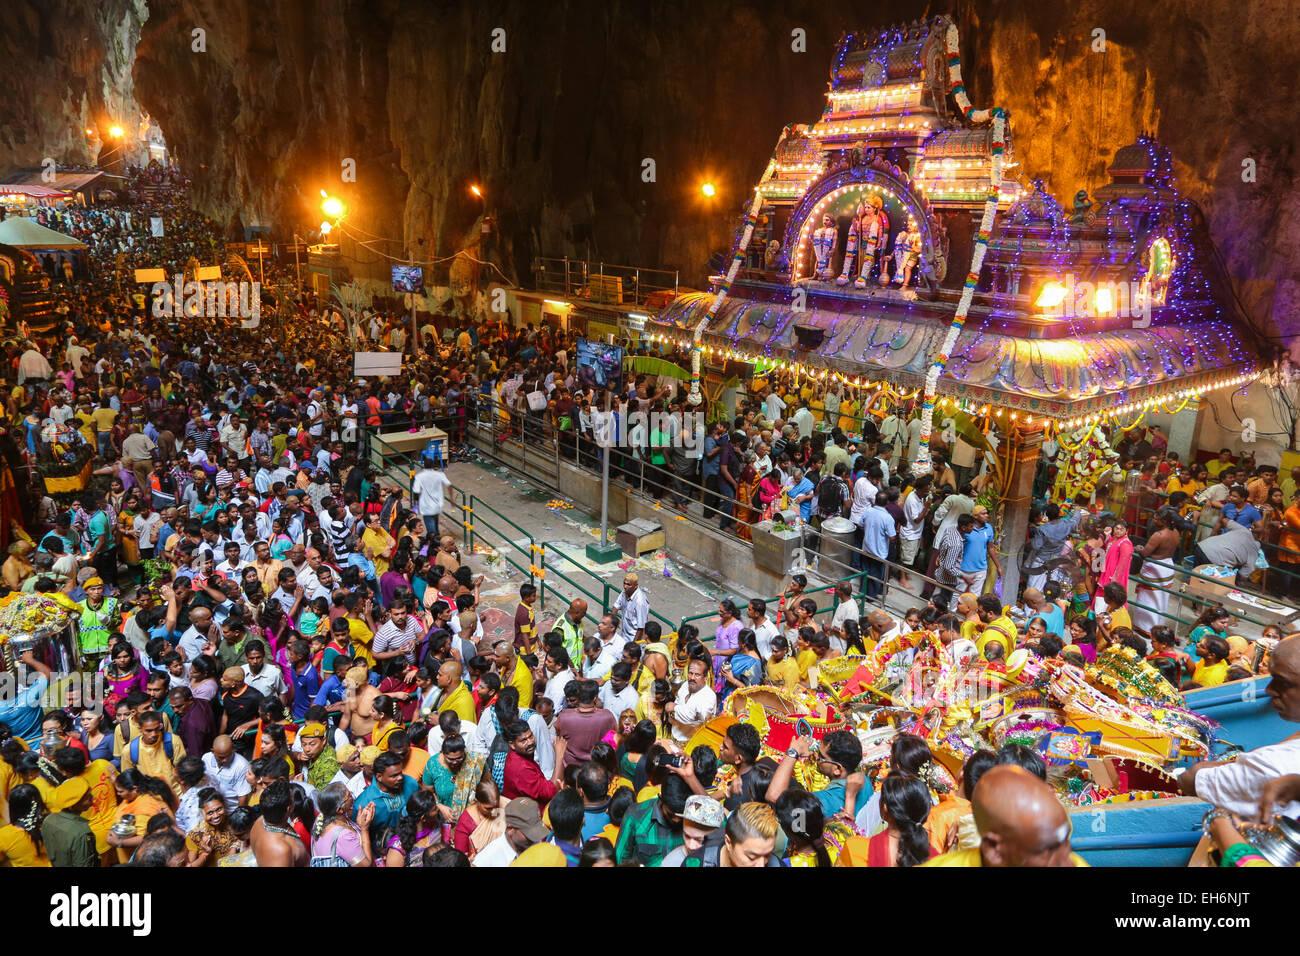 Huge crowd inside the batu cave temple, Kuala Lumpur Malaysia during Thaipusam festival on 3rd FEB 2015. Stock Photo